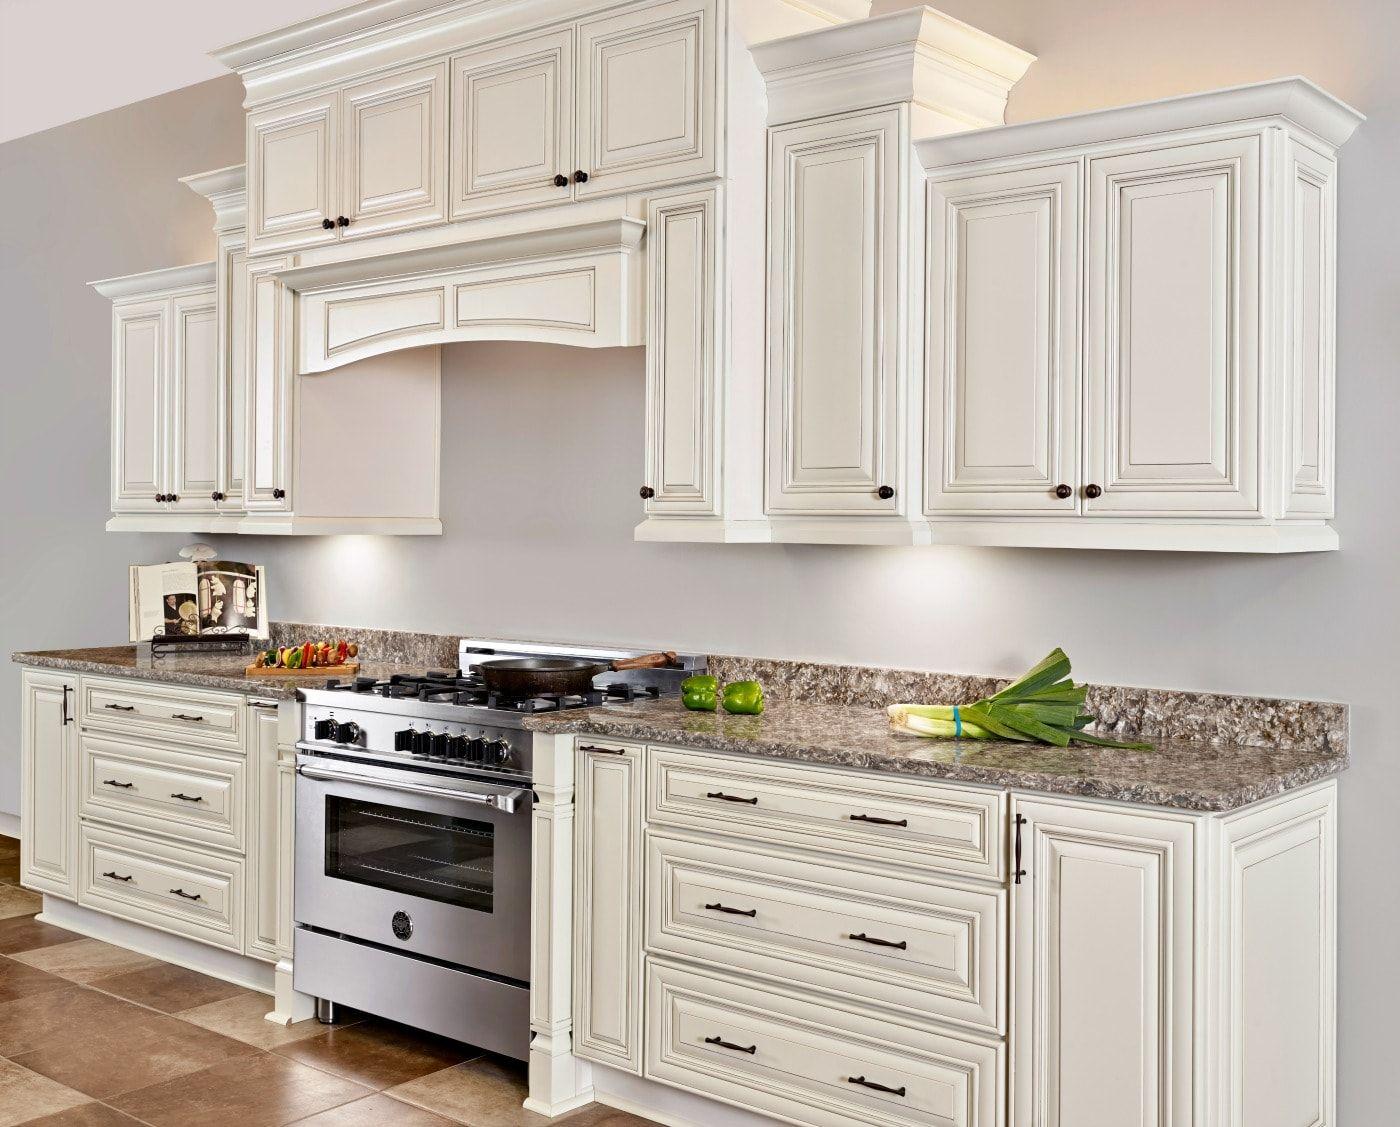 Lexington Oatmeal Glaze Distressed Kitchen Cabinets Kitchen Cabinets Kitchen Design